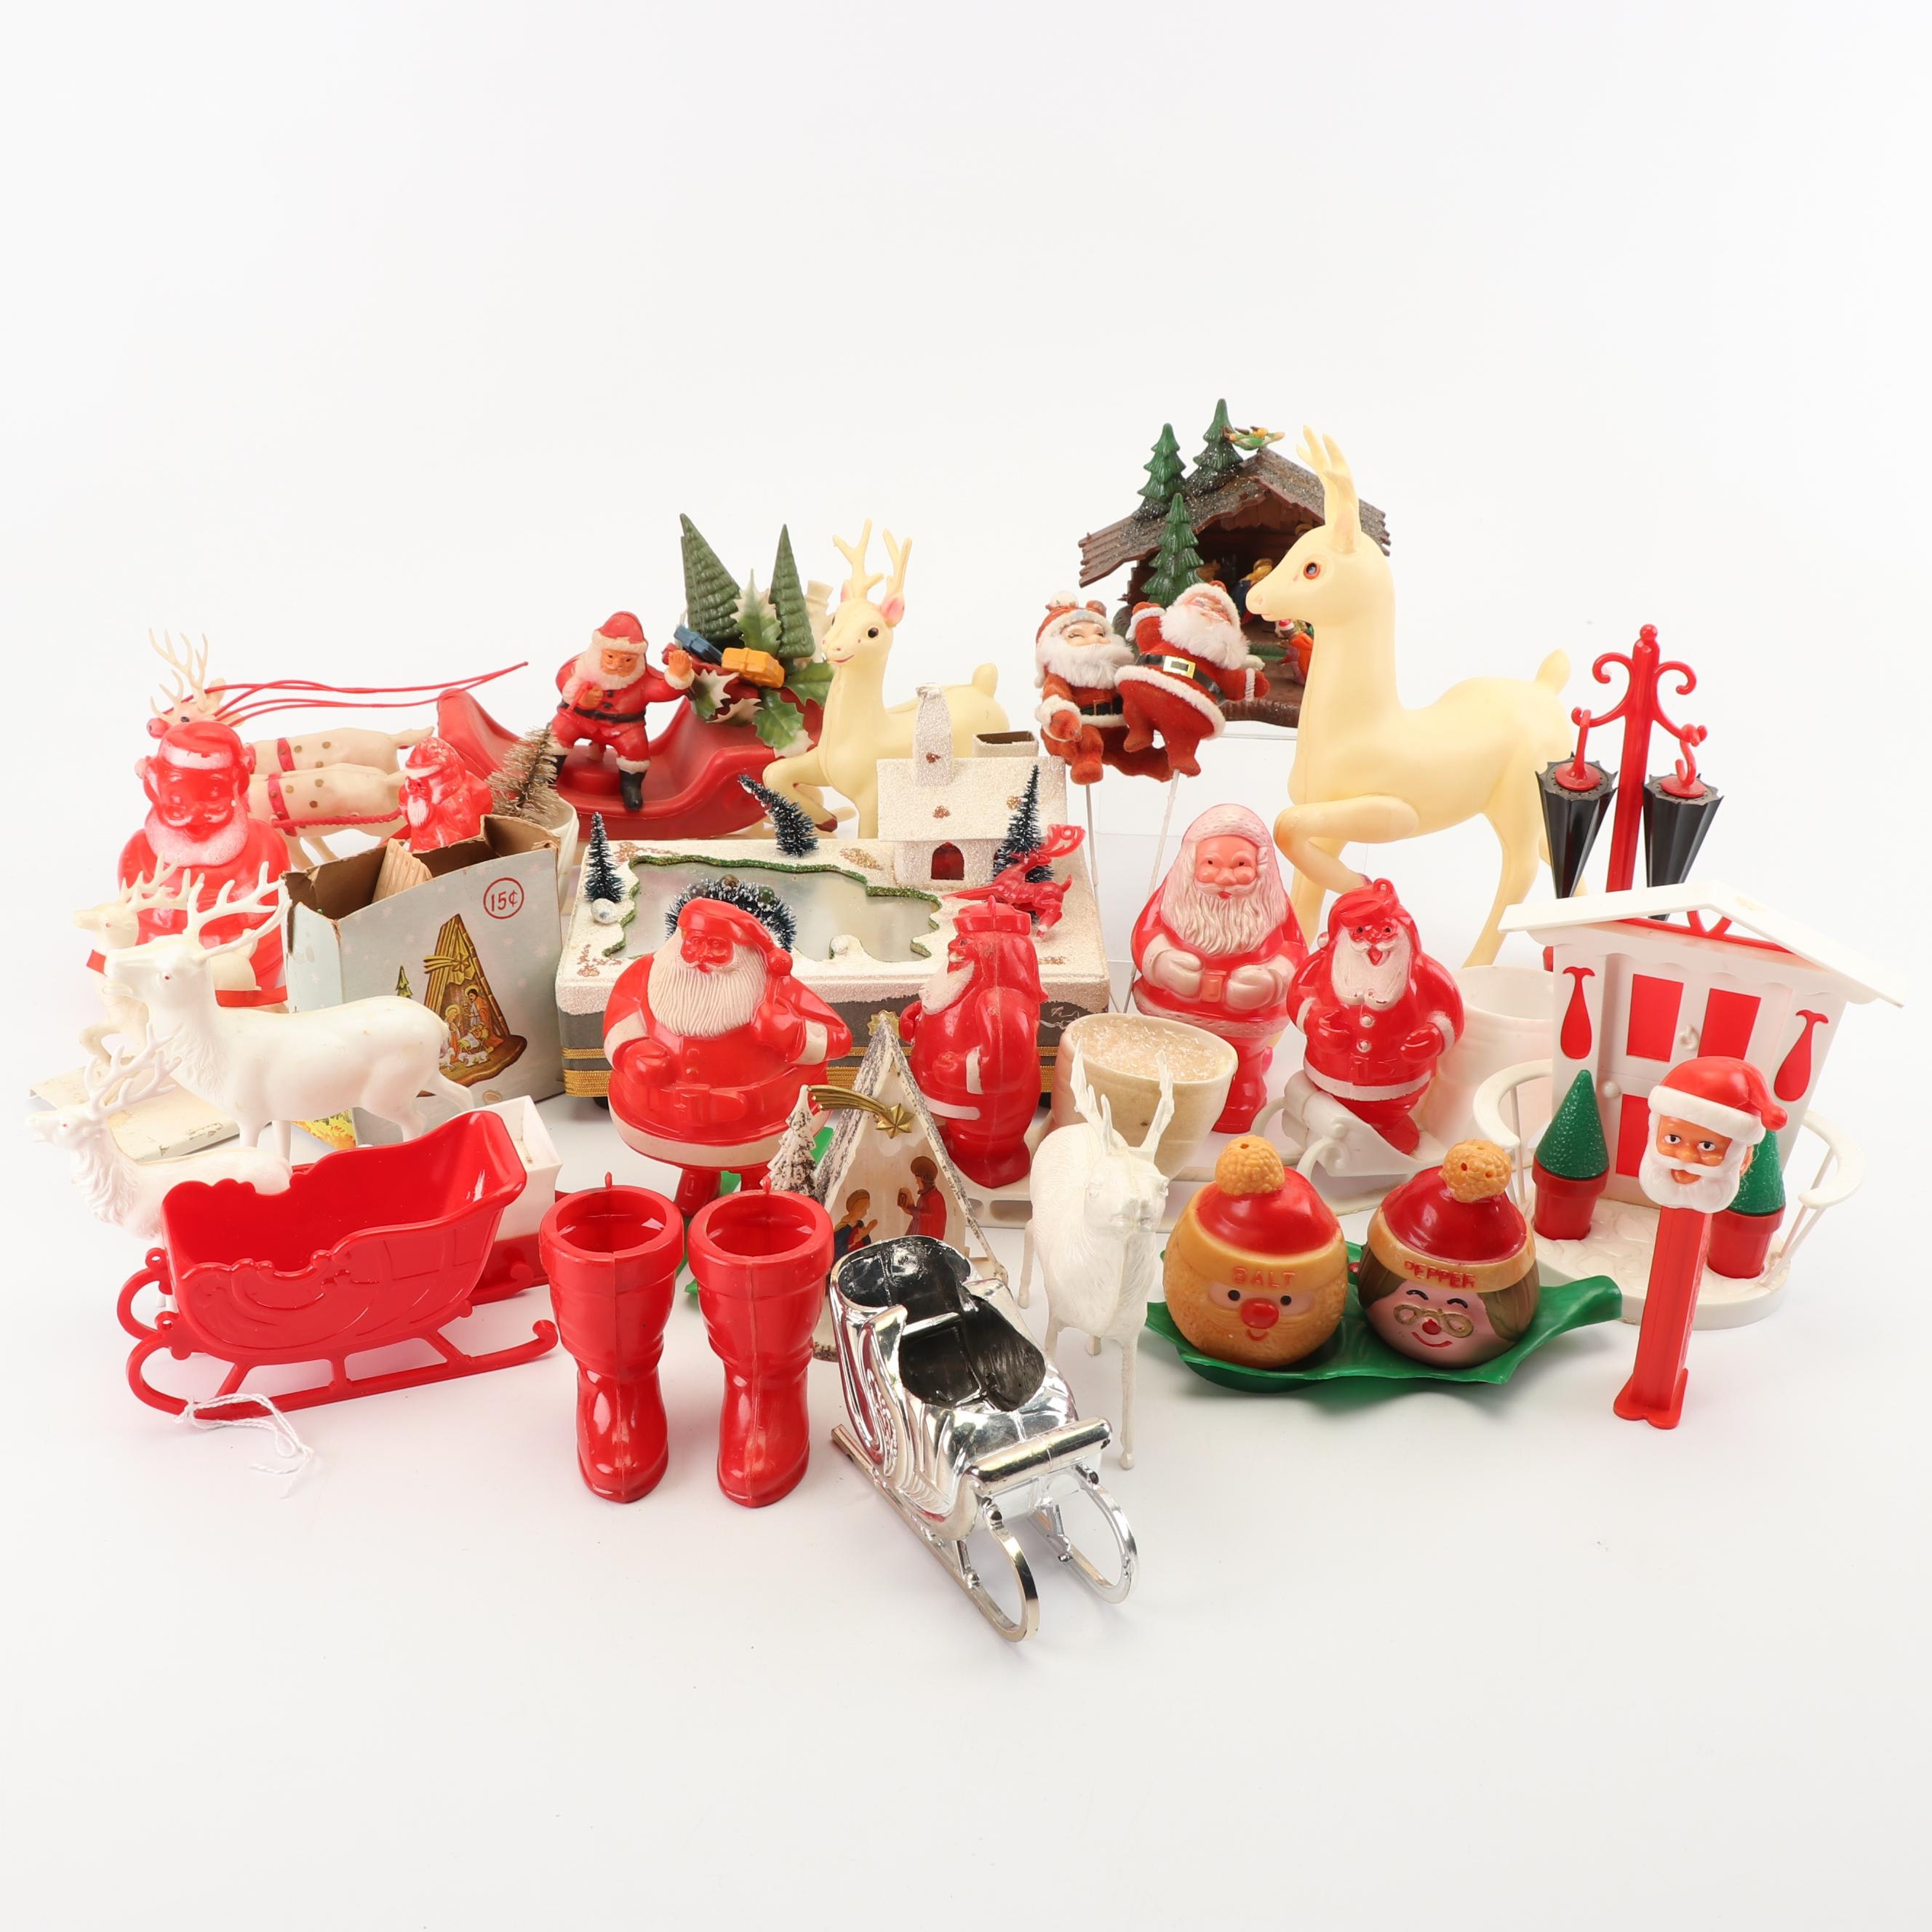 Plastic Christmas Decor, Mid Century